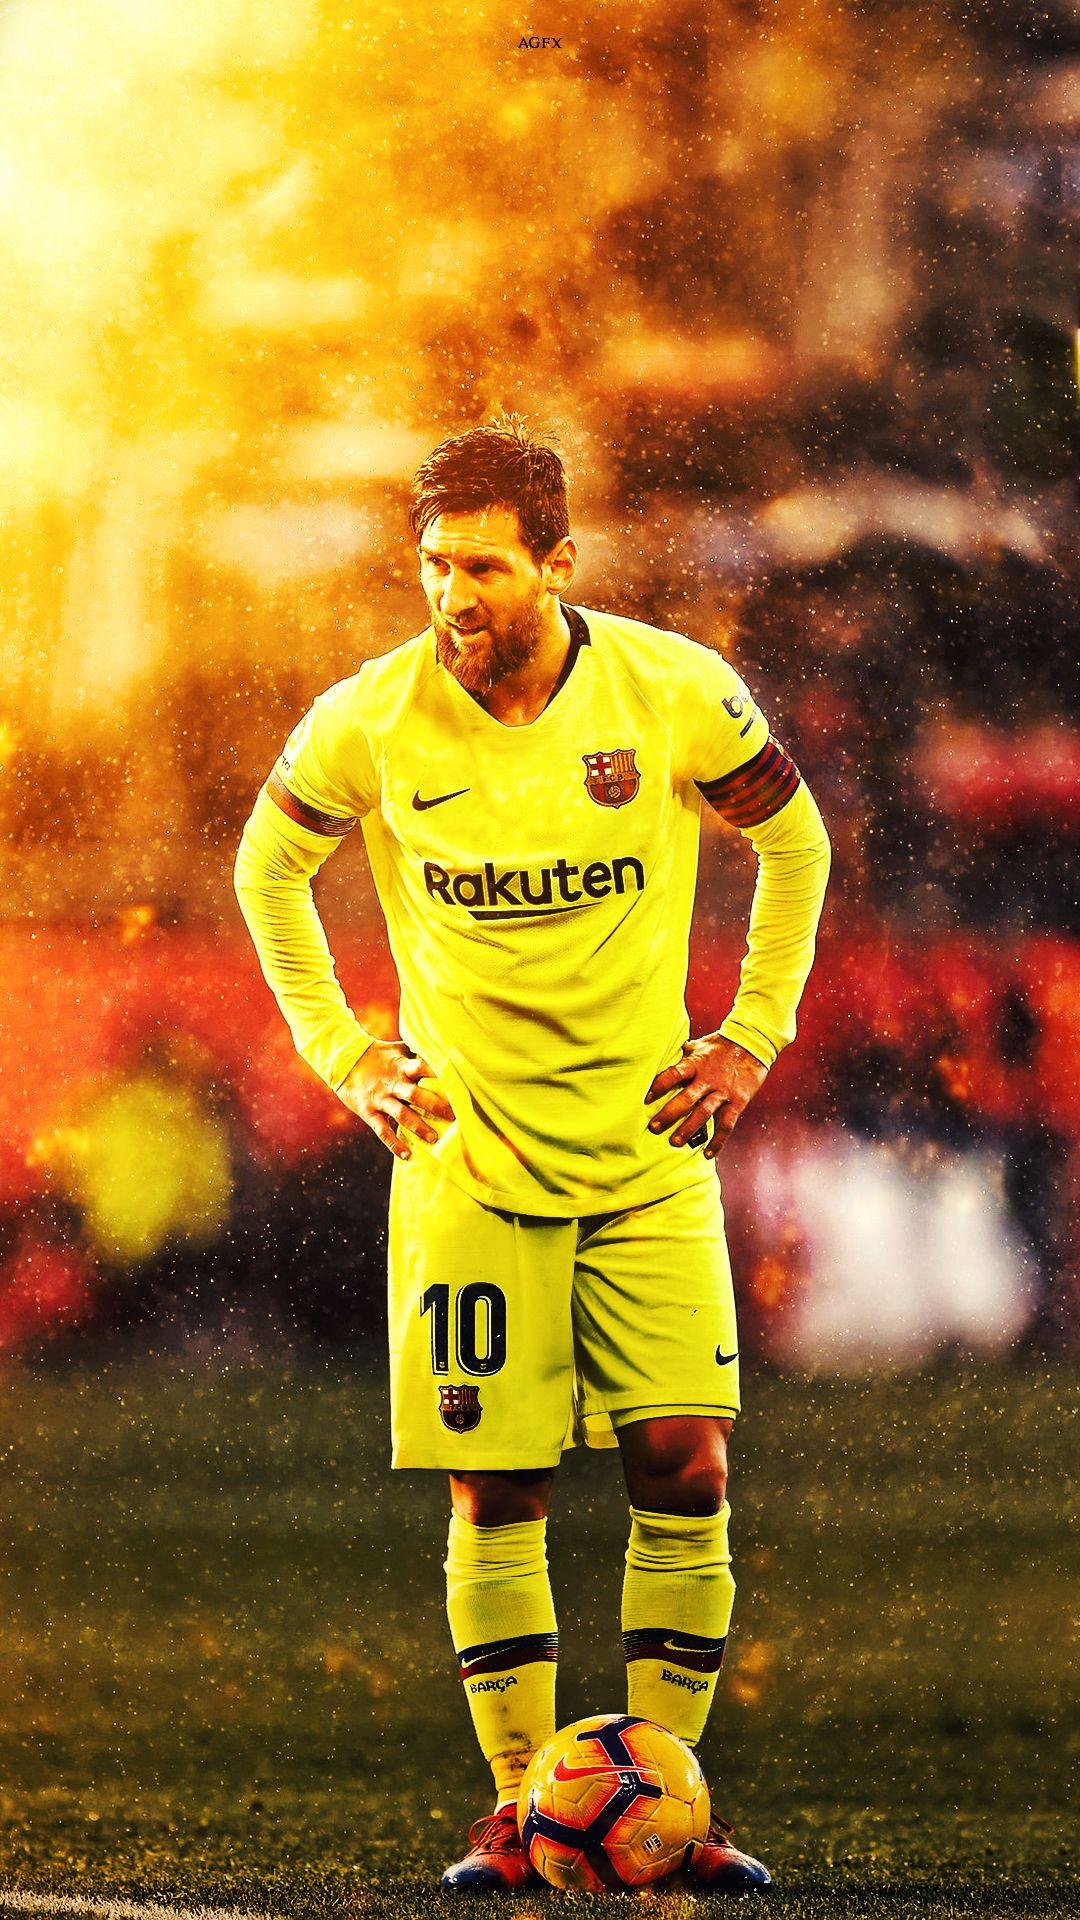 Agfx Designs On Twitter Messi Soccer Lionel Messi Leonel Messi